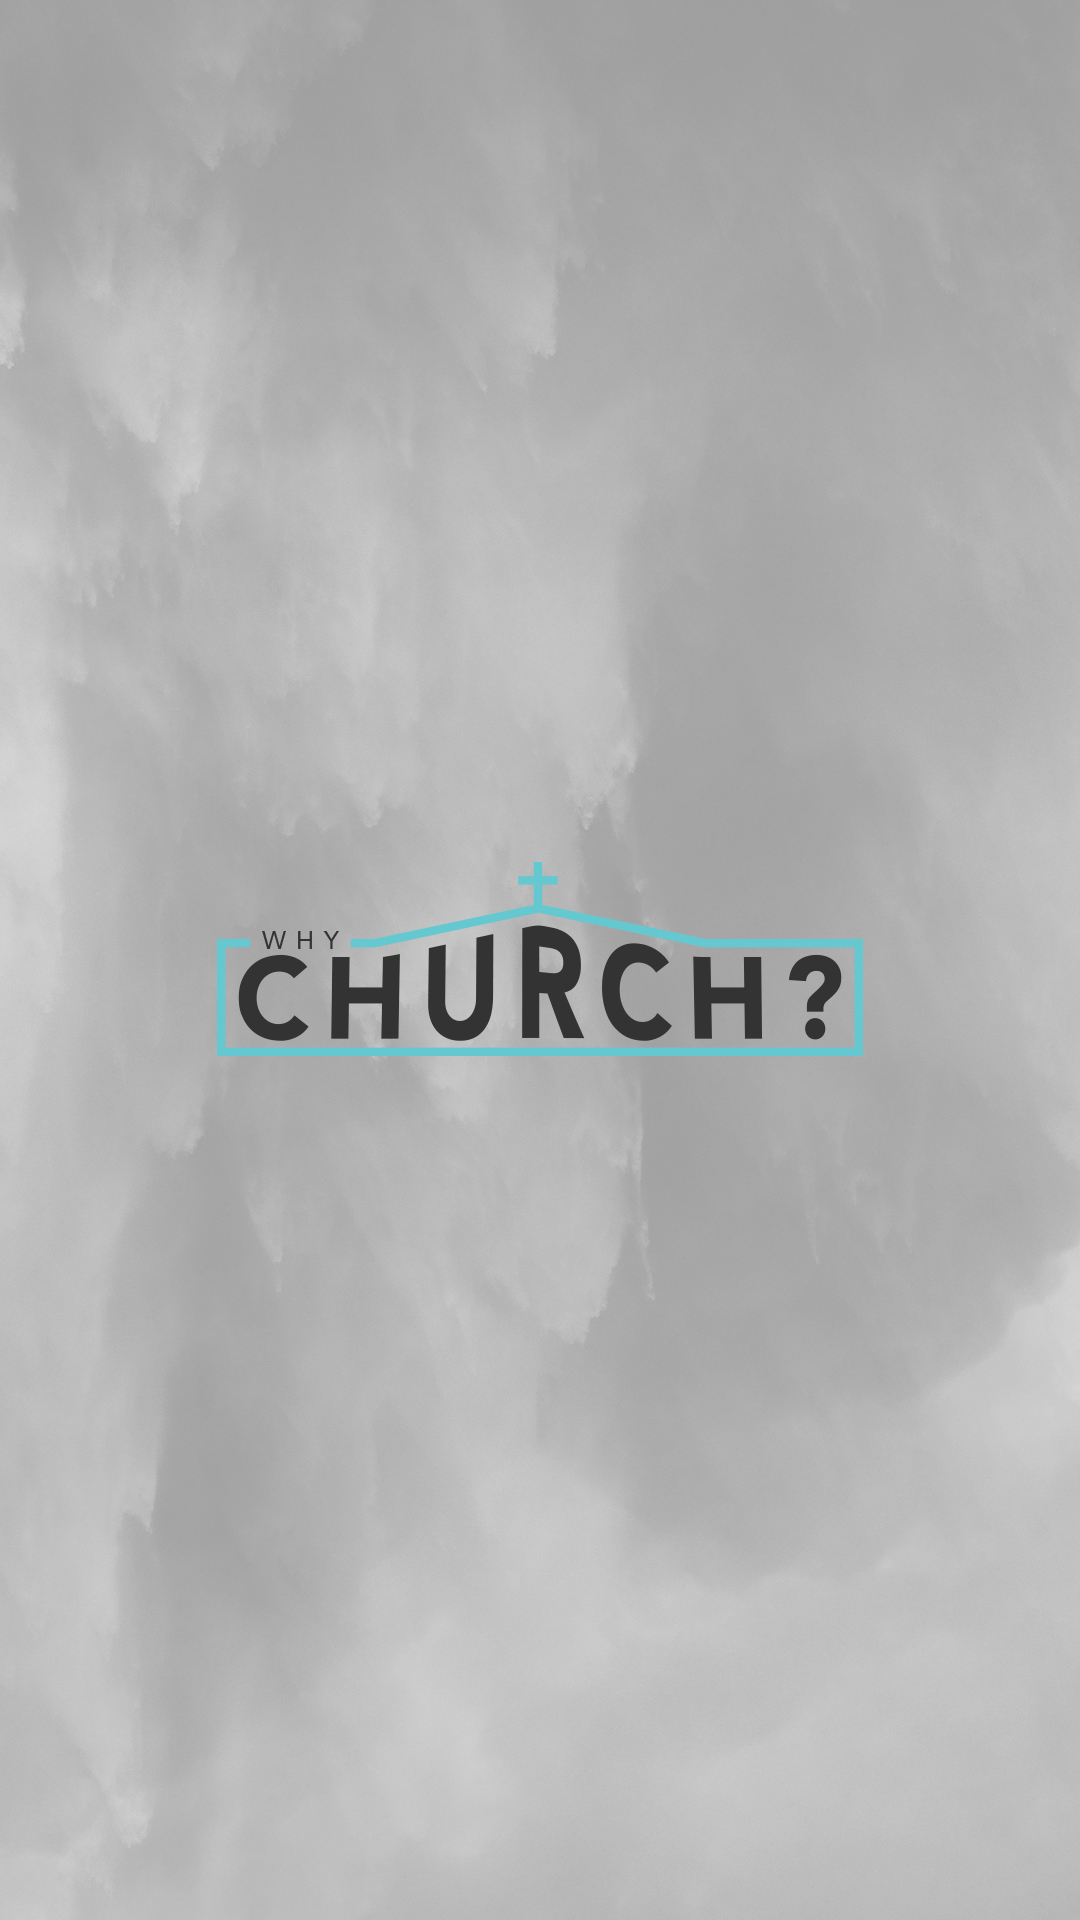 Why Church Instastory 2.jpg